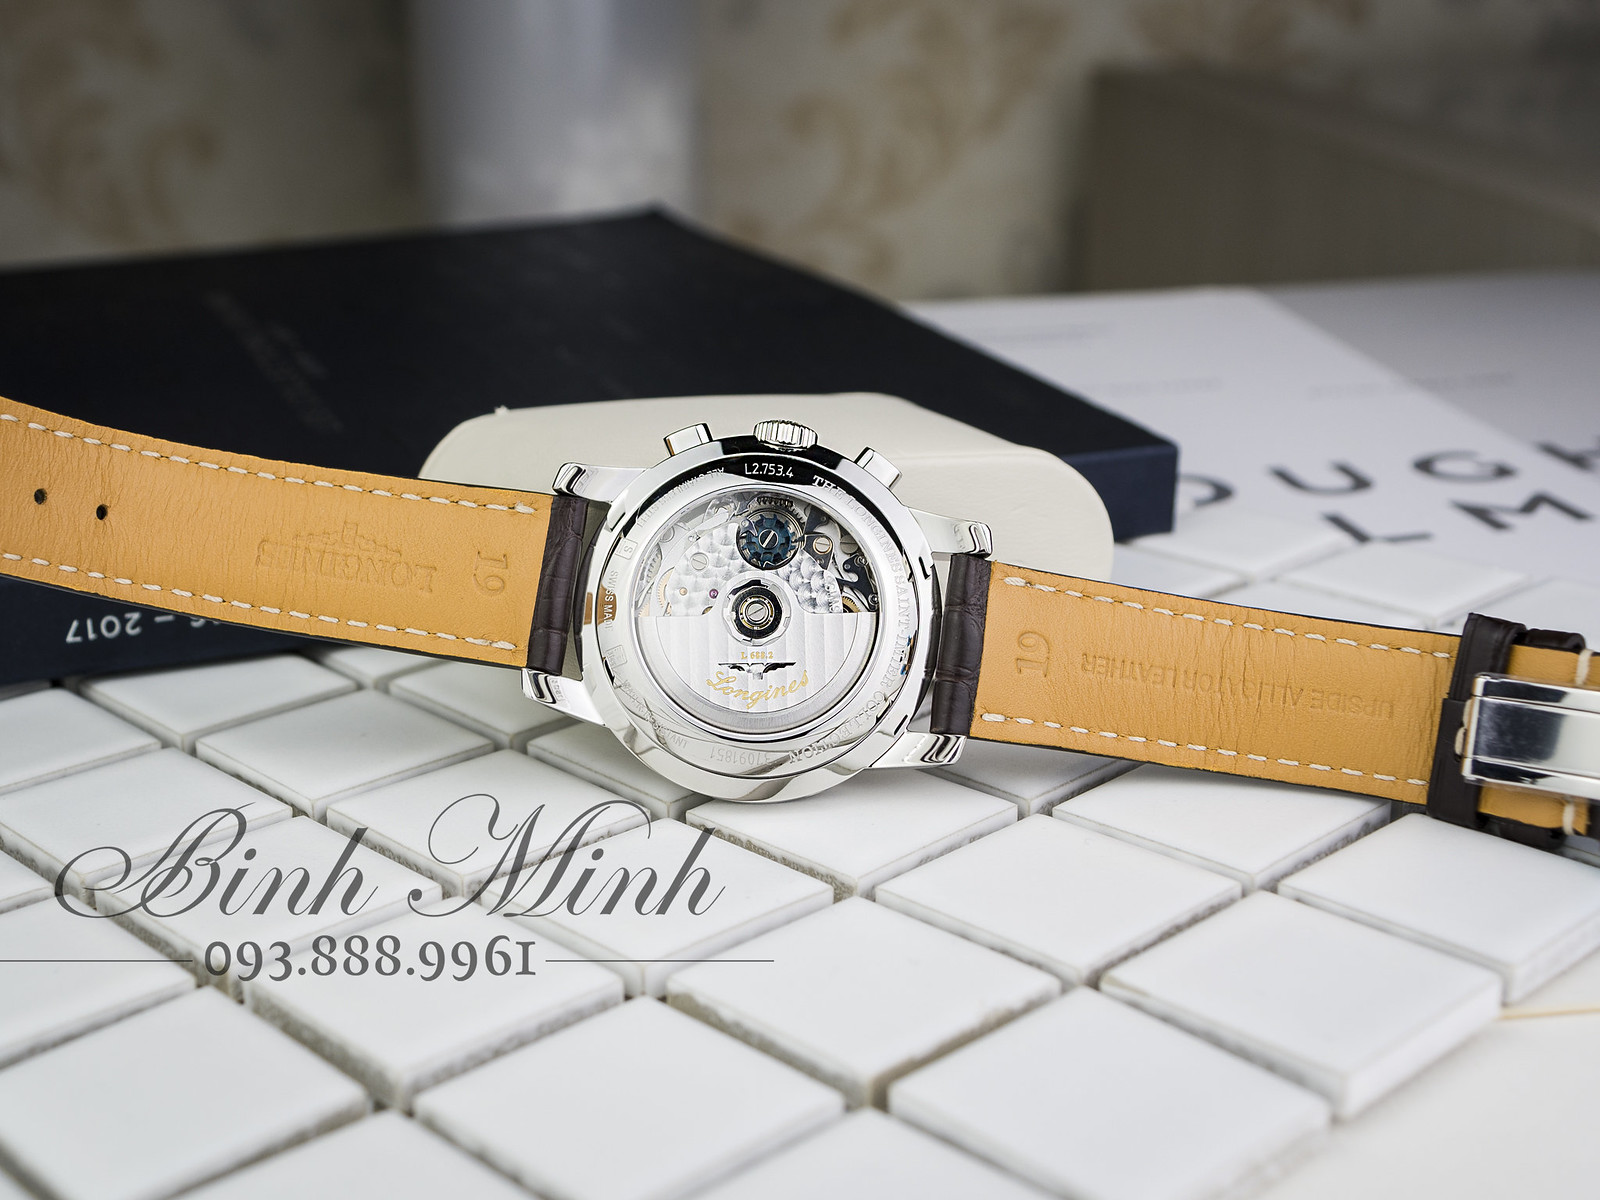 Đồng hồ Longines Saint Imier Chronograph máy Automatic mới 100%, đủ hộp sổ thẻ.